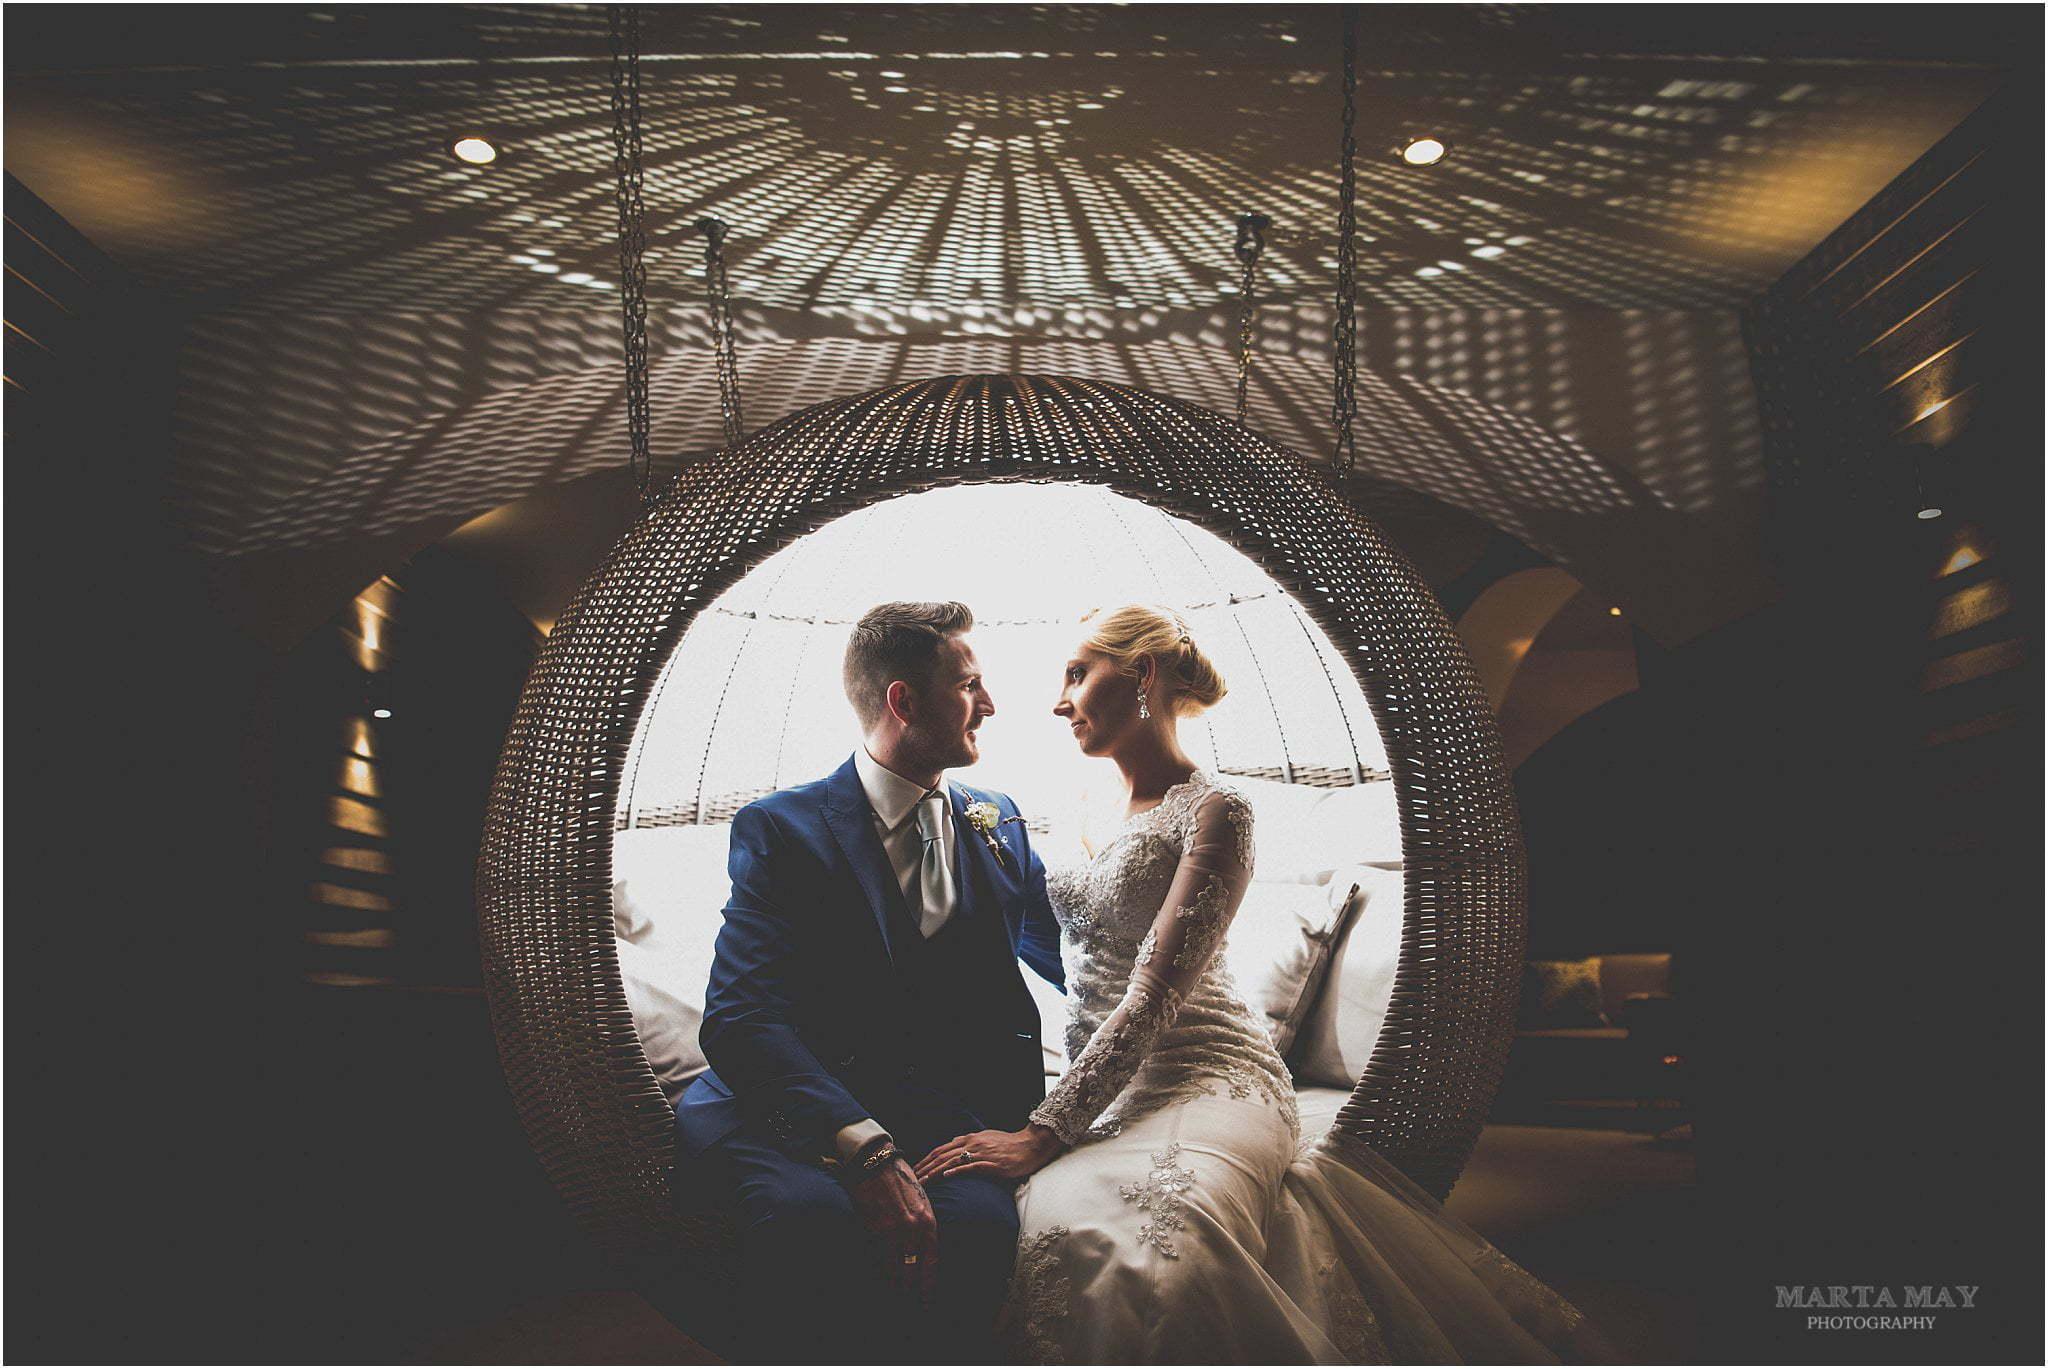 creative portrait bride groom